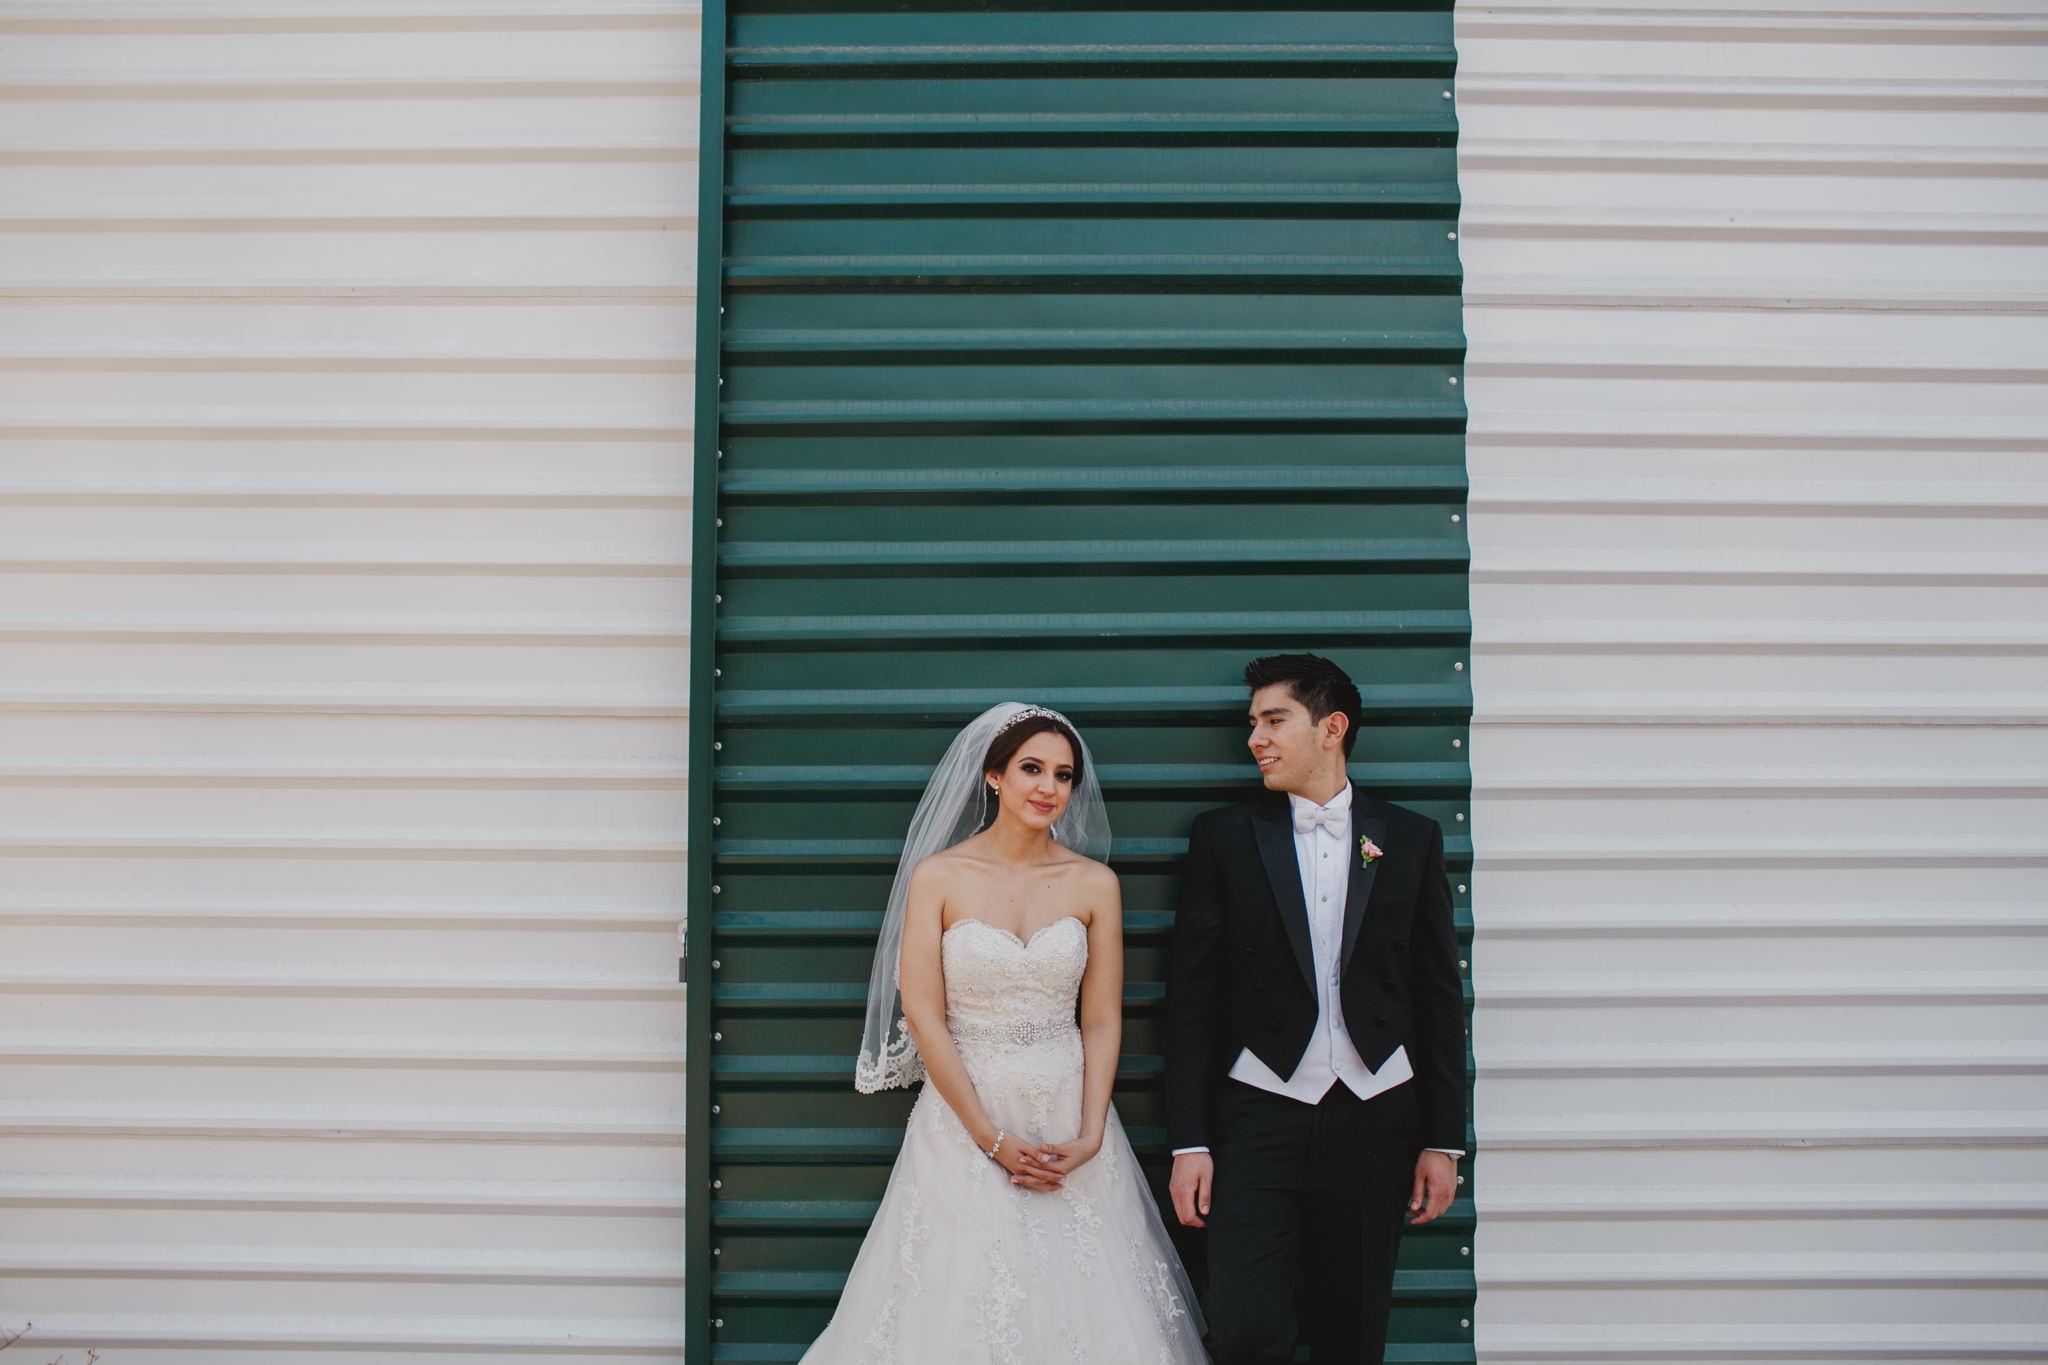 boda-en-torreon-armando-aragon-16